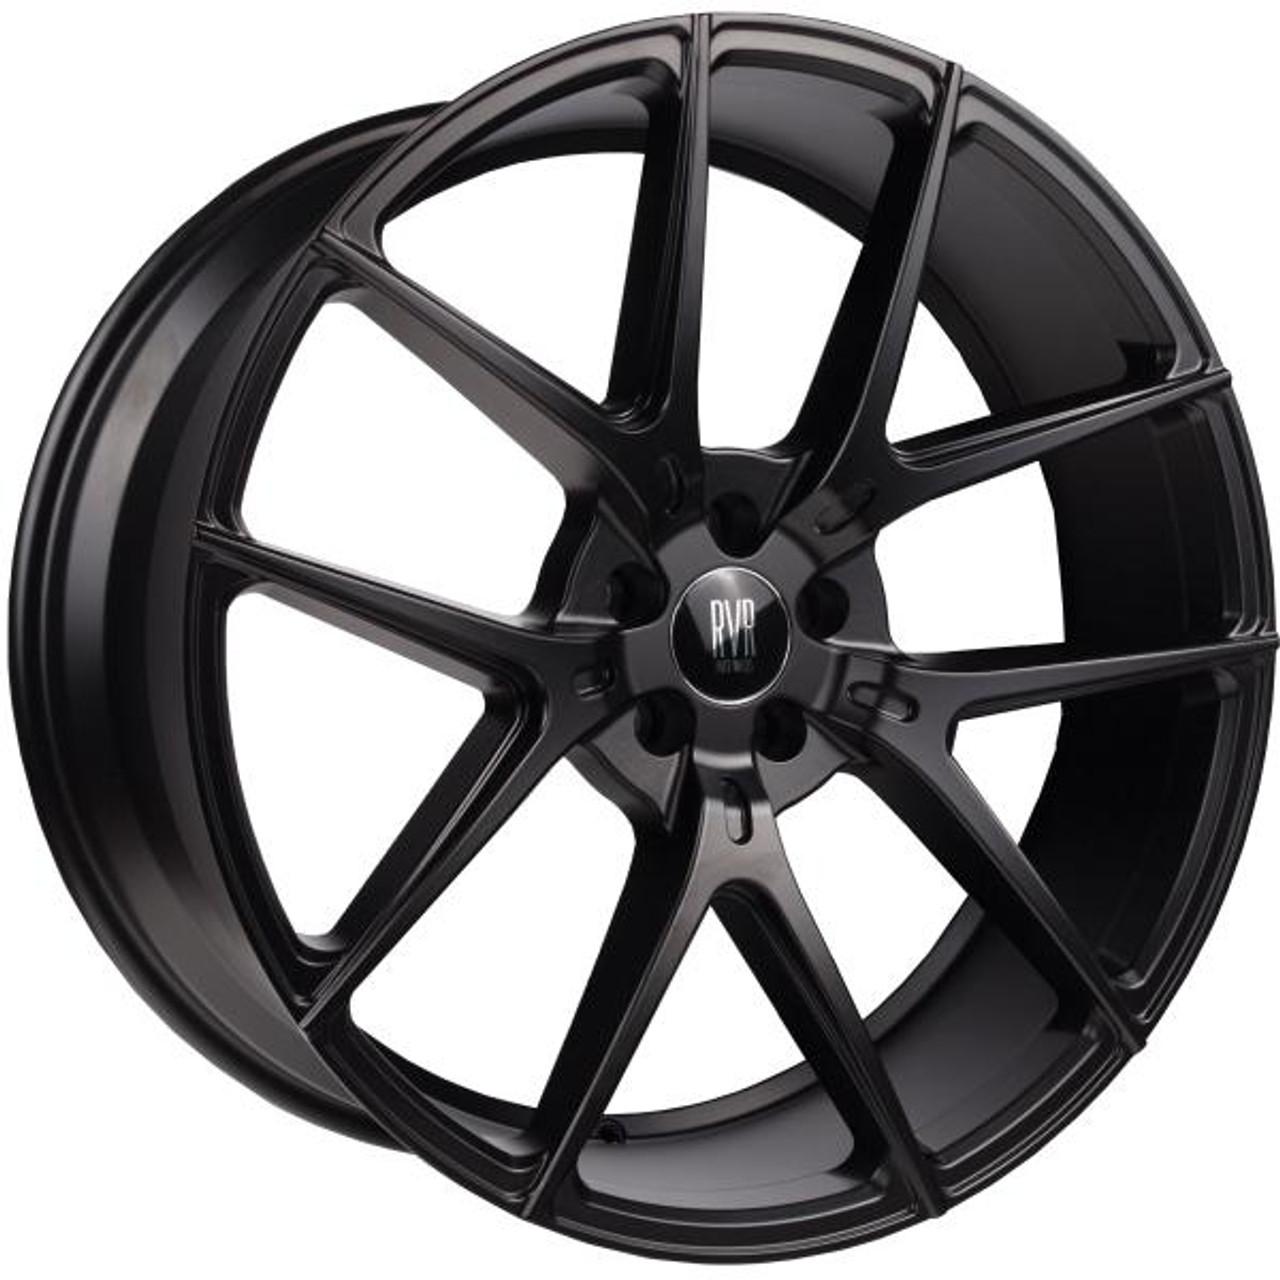 River R9 Alloy Wheels Matt Black